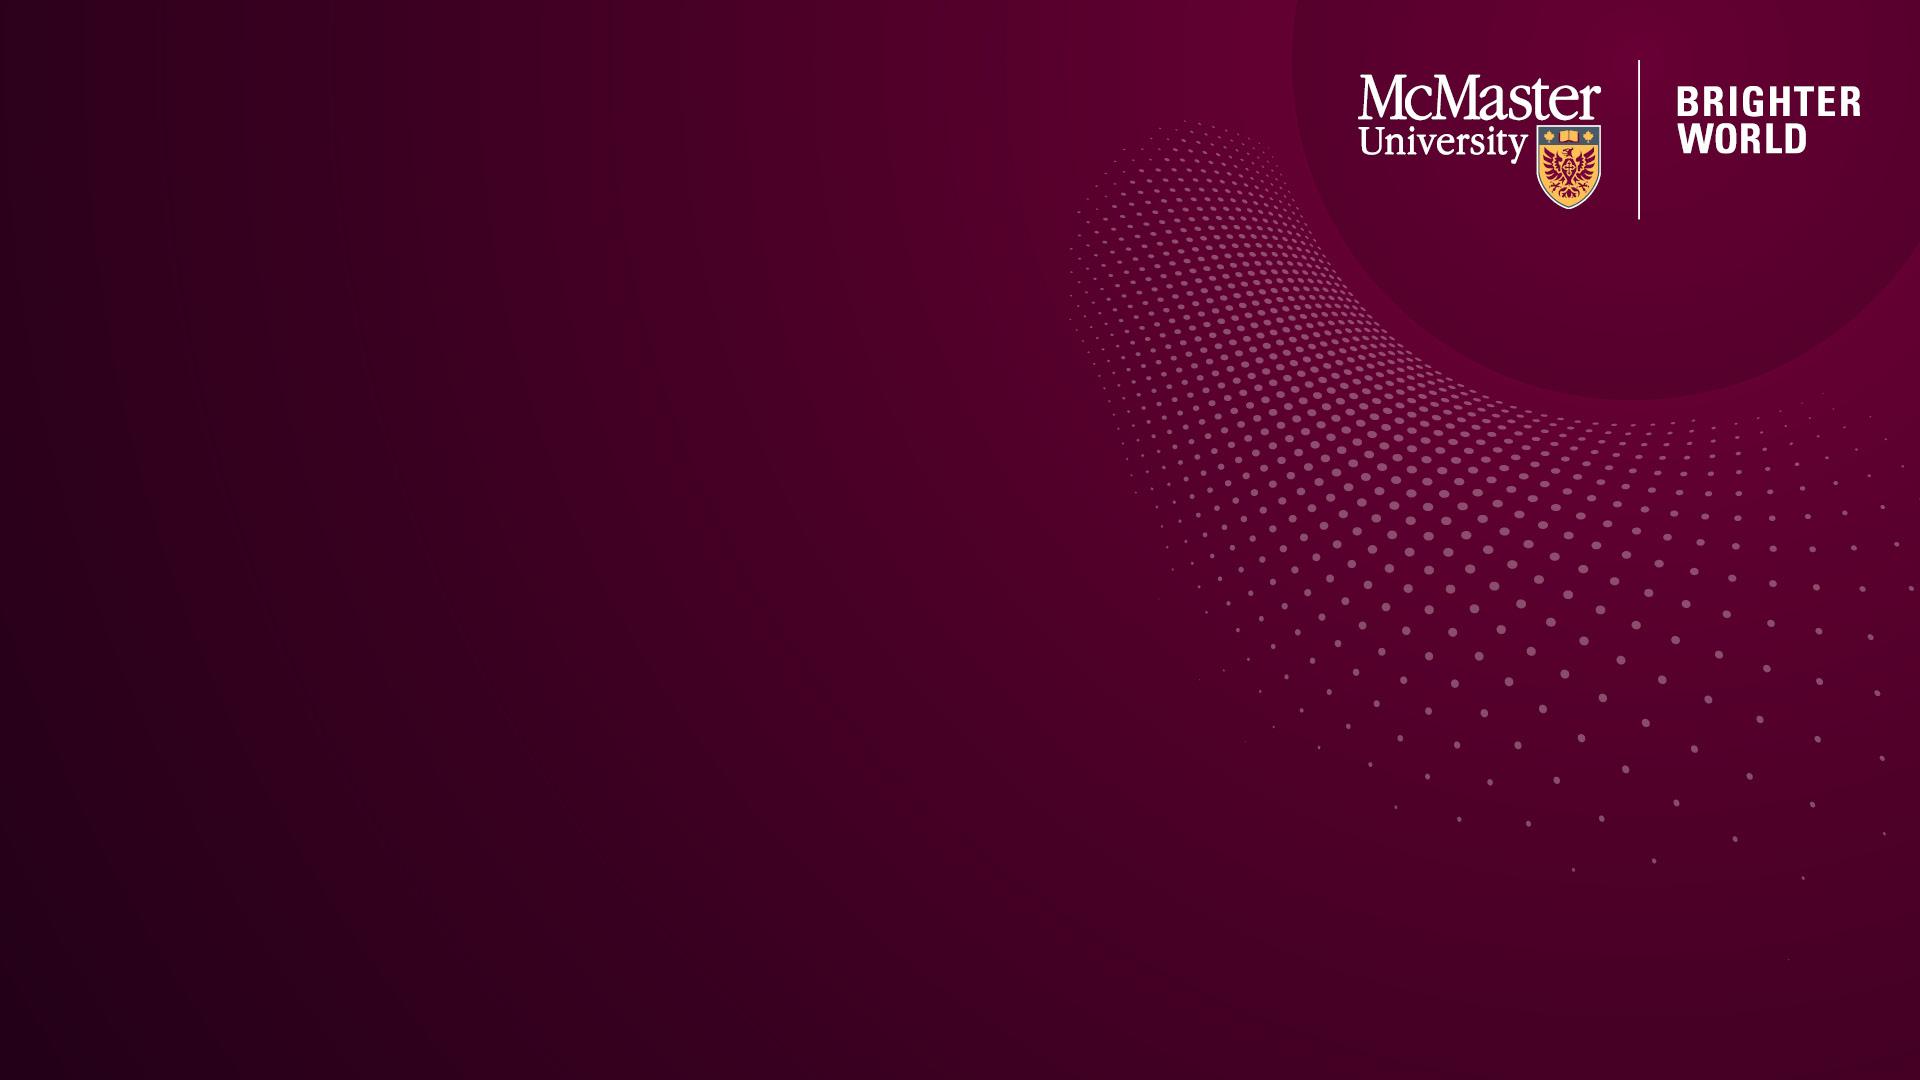 Maroon McMaster Branded Zoom Background